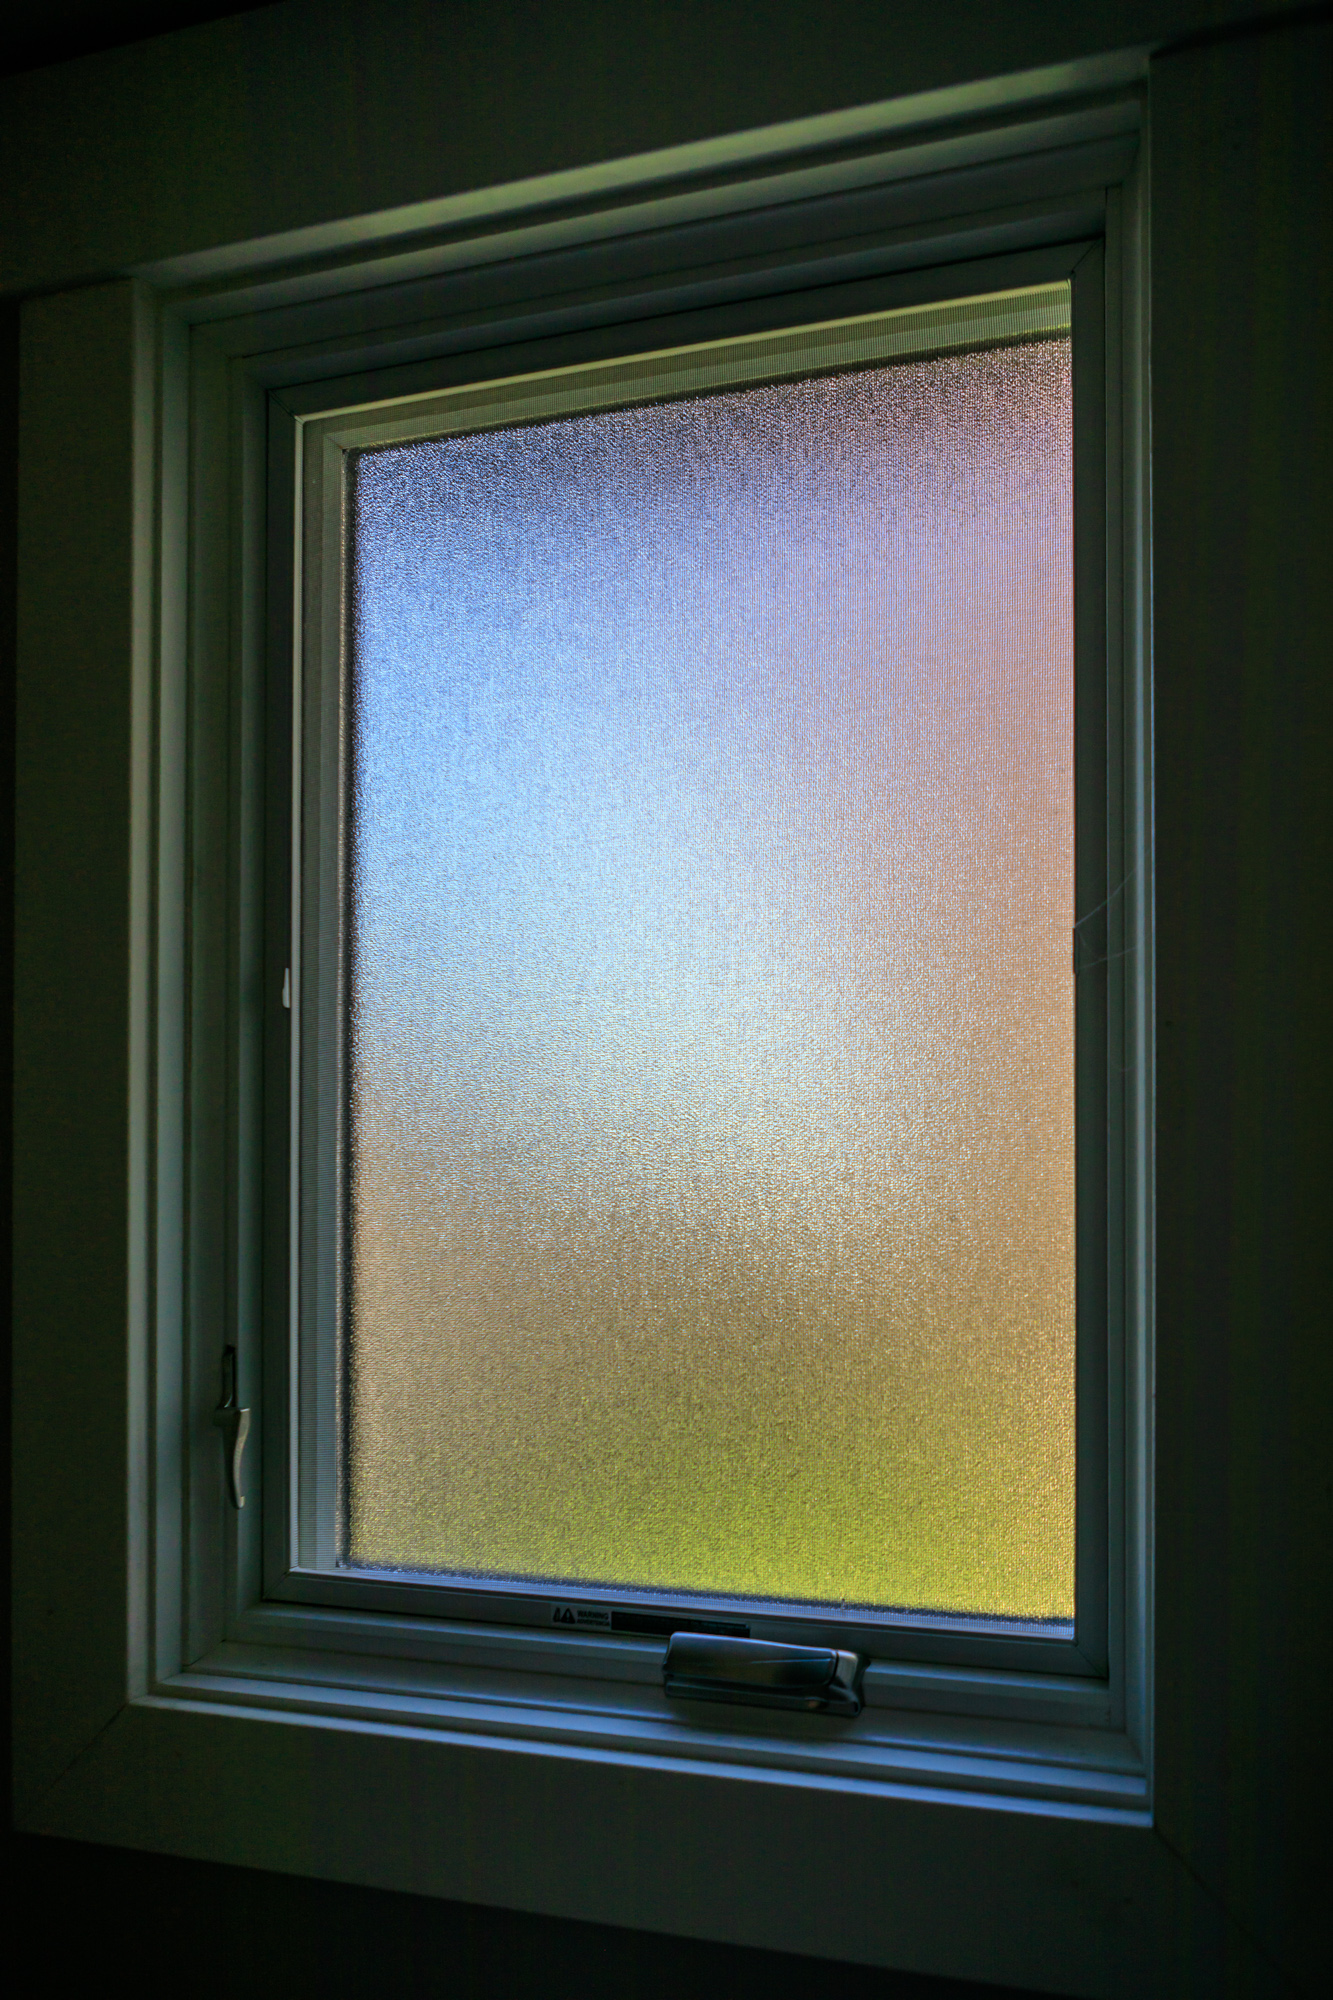 A colorful window shot during corona virus lockdown